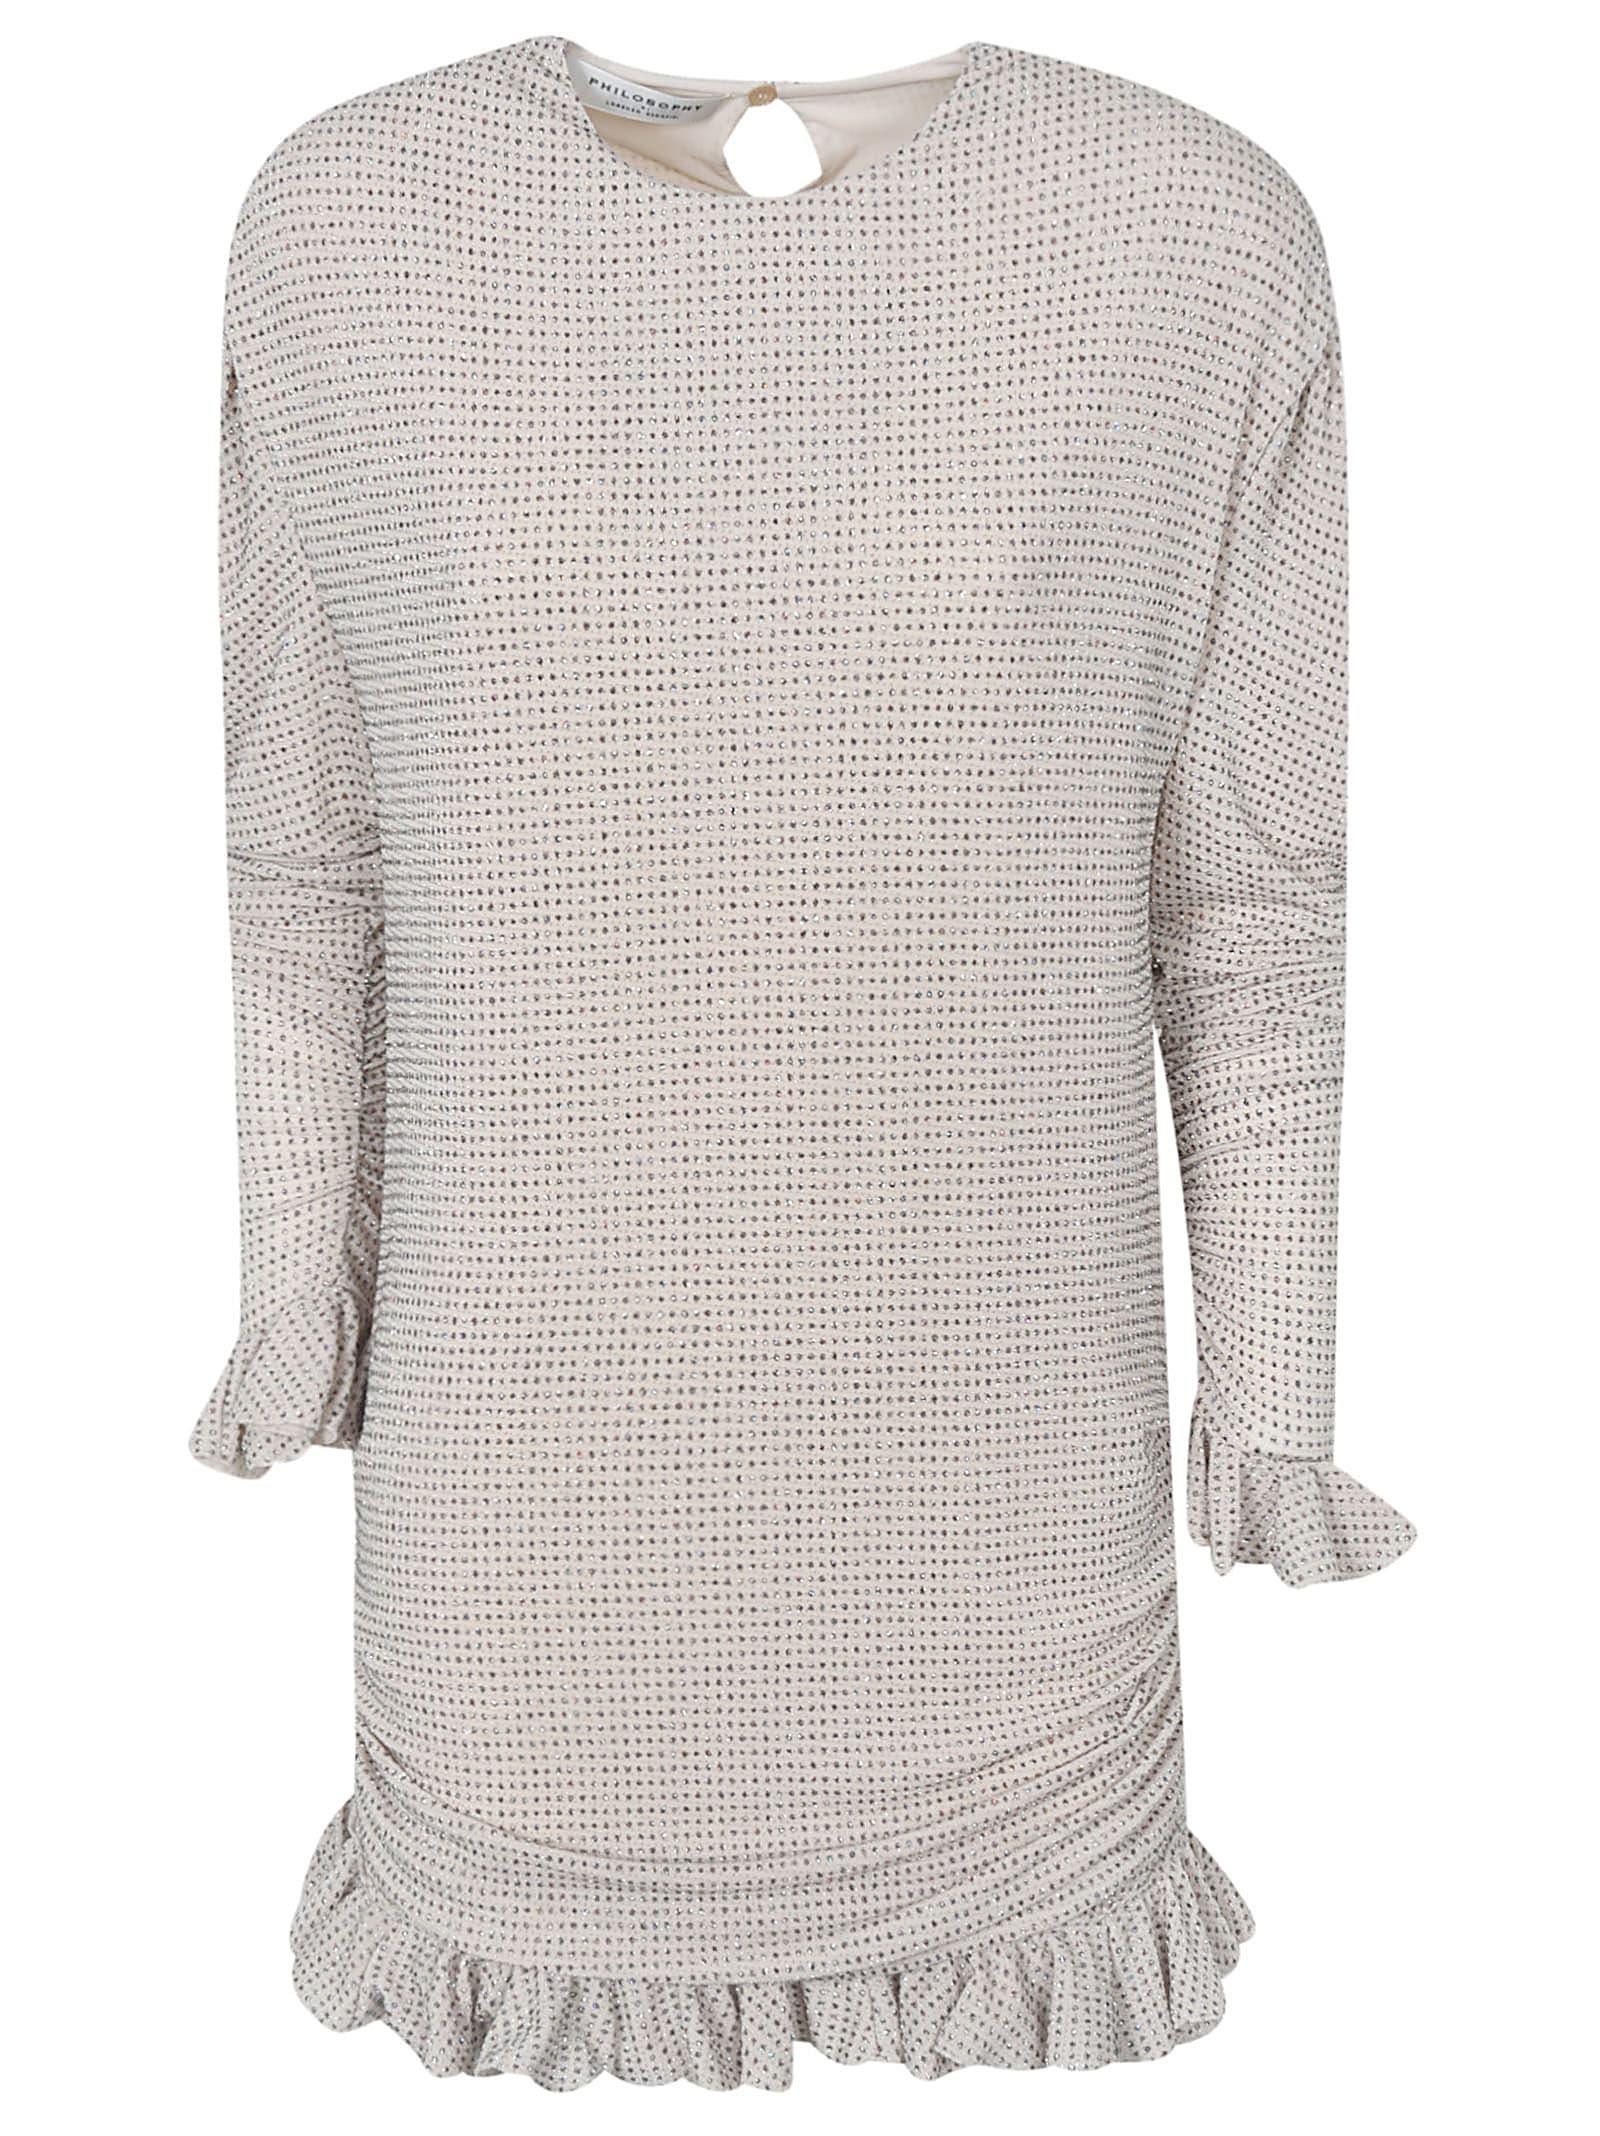 Buy Philosophy di Lorenzo Serafini Ruffled Hem Dress online, shop Philosophy di Lorenzo Serafini with free shipping